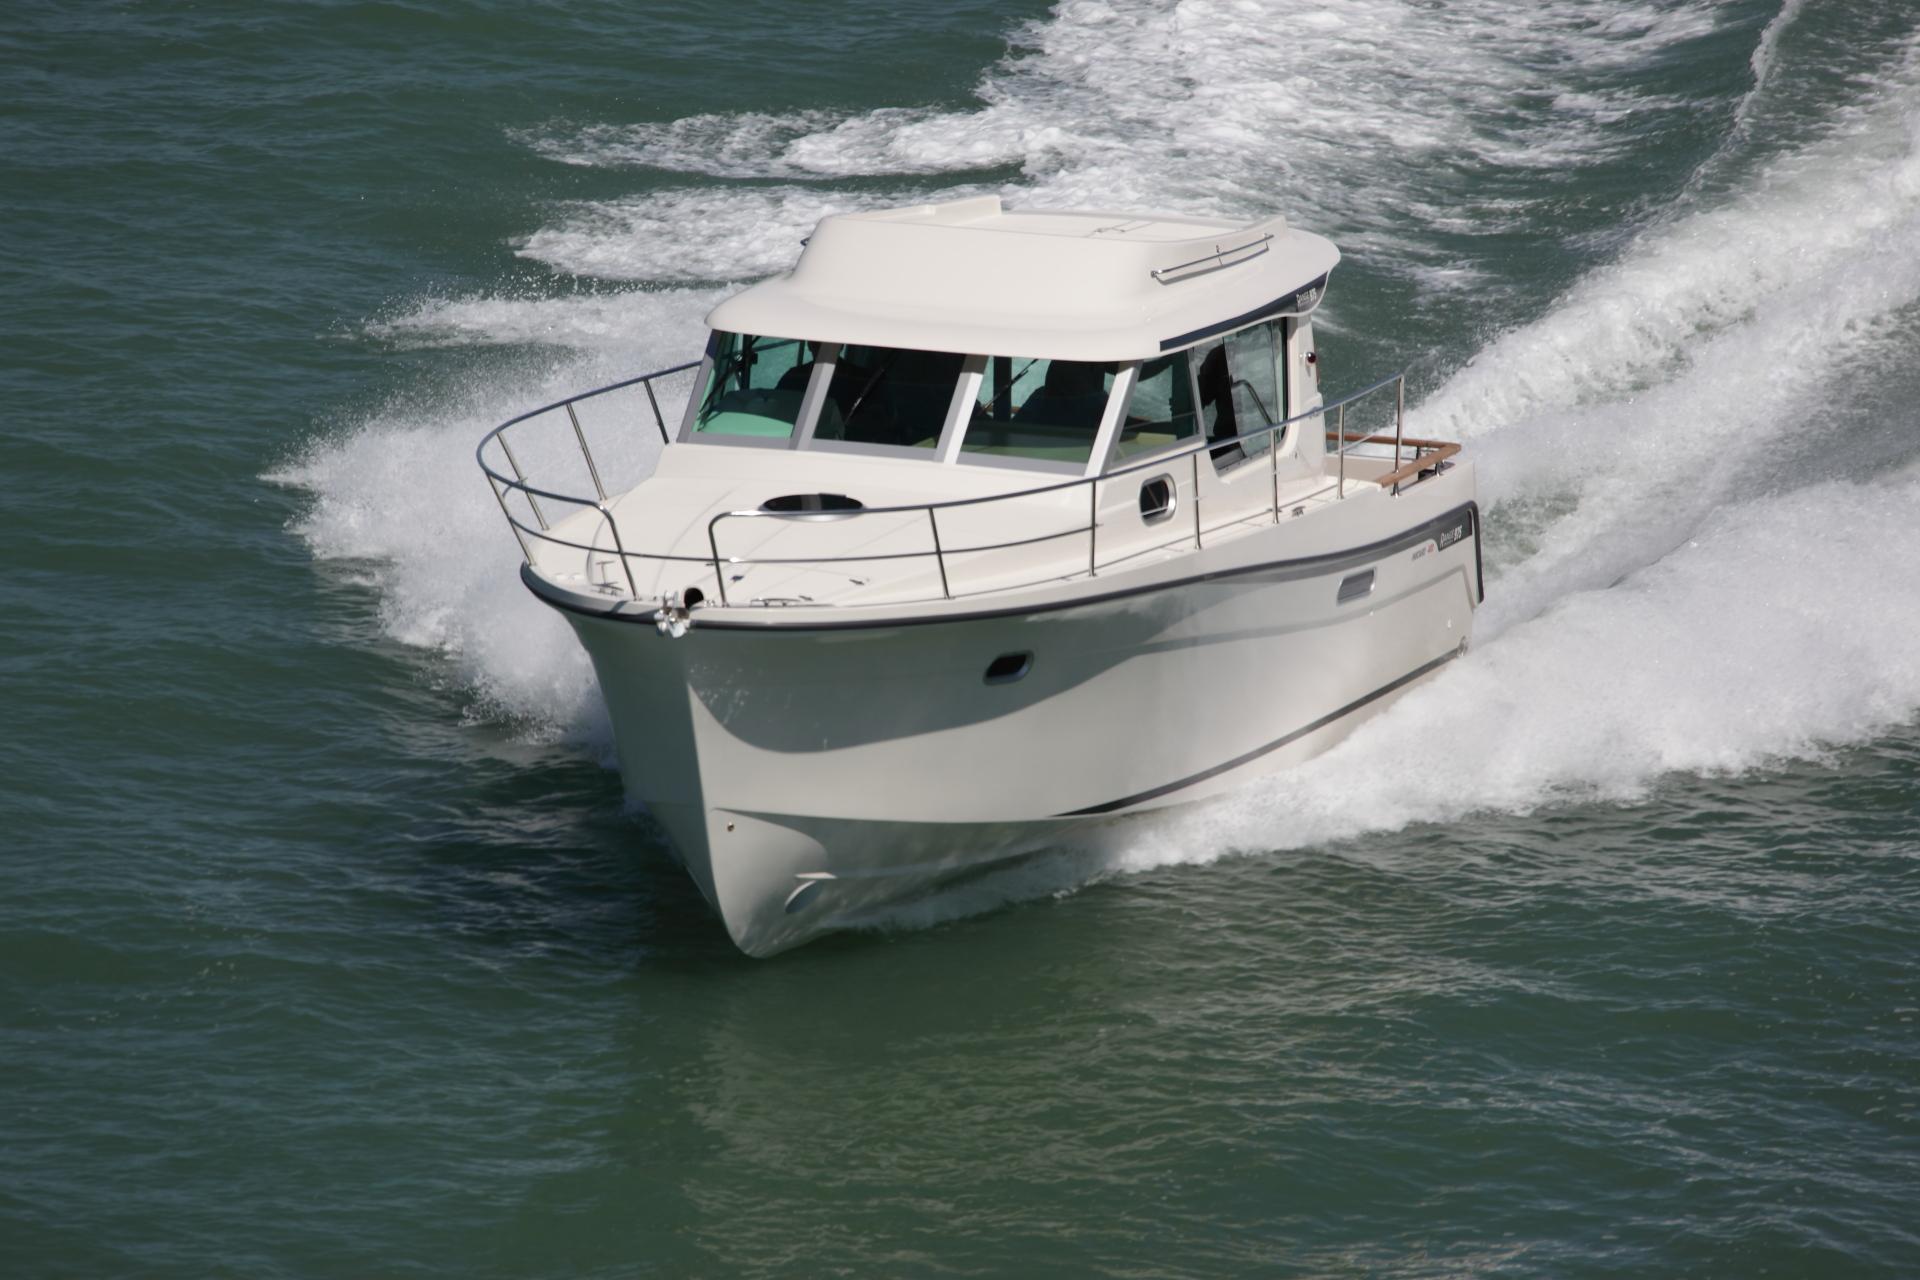 Cruiser motor boat ocqueteau ocqueteau sport boat range for Fishing boat motor